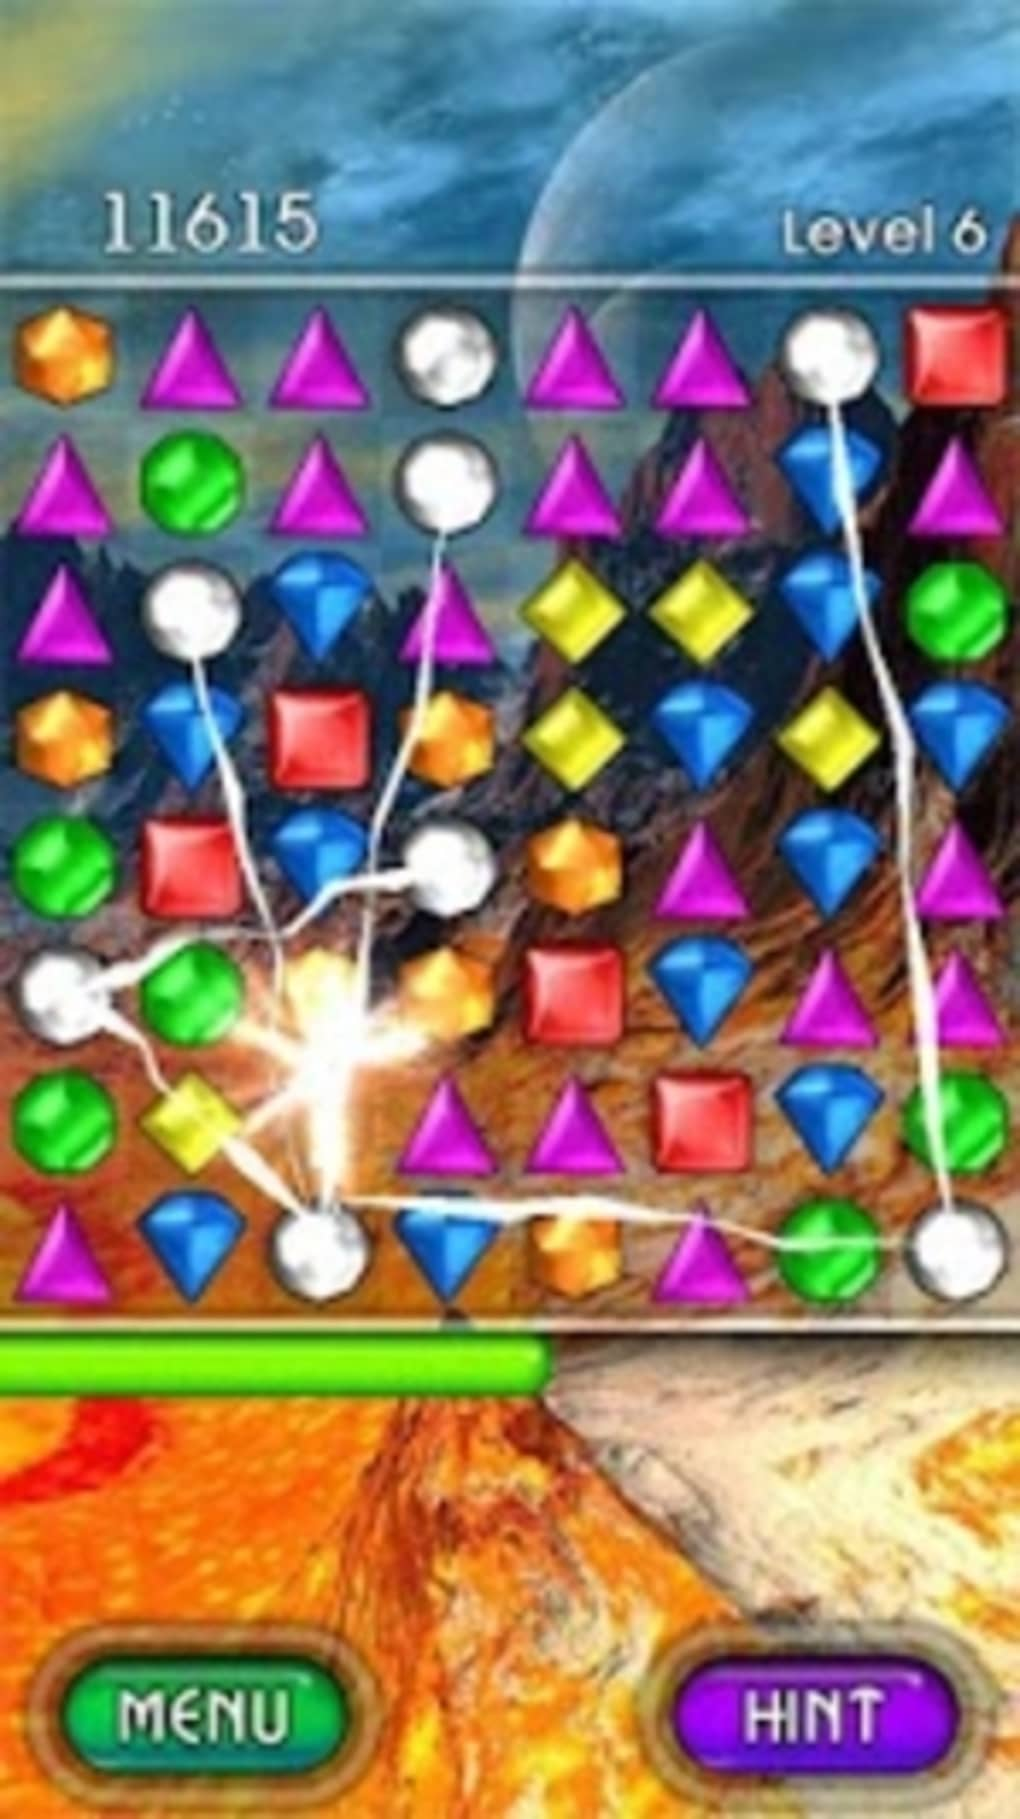 Bejeweled download.